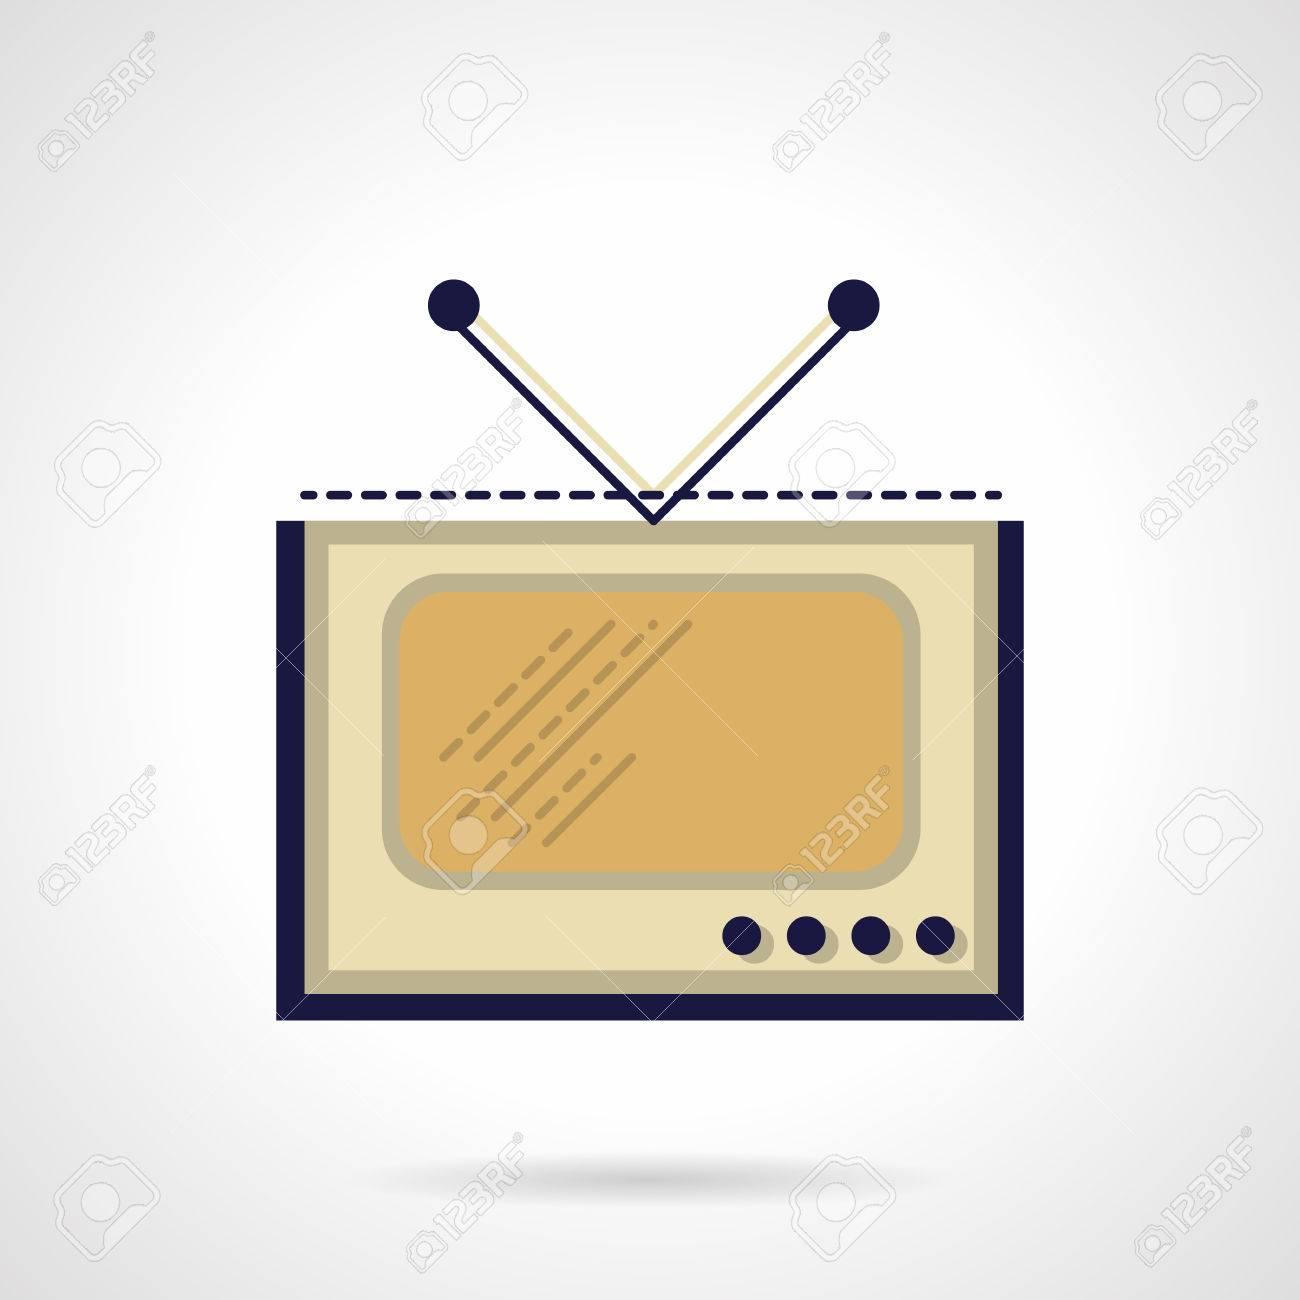 Retro TV with V-shape antenna  Media symbols, broadcasting, television